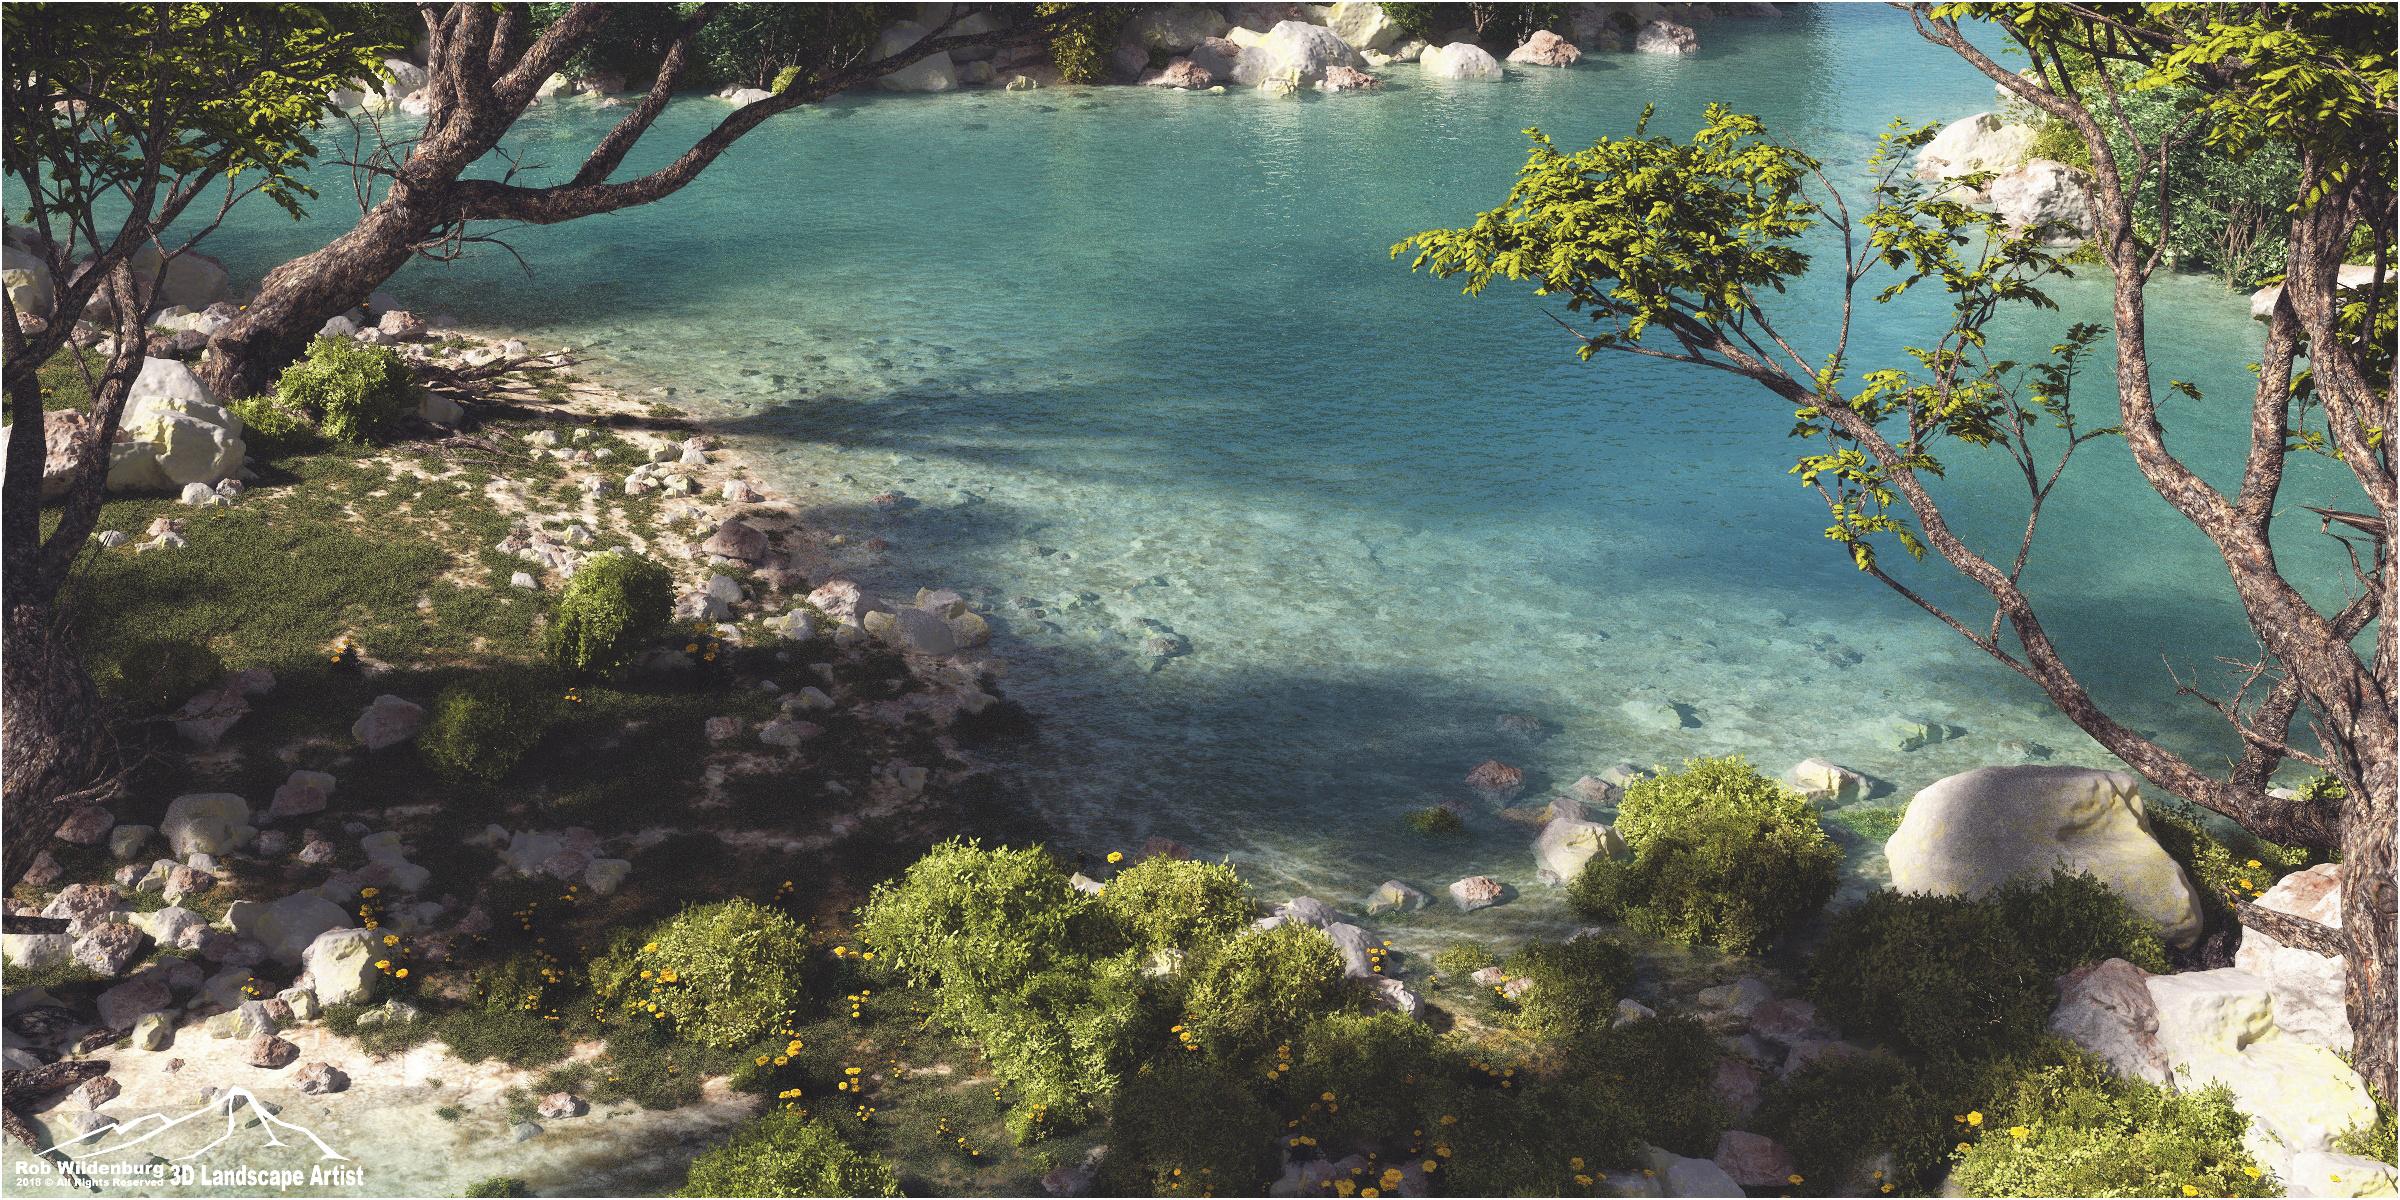 Blue water Creek by 3DLandscapeArtist